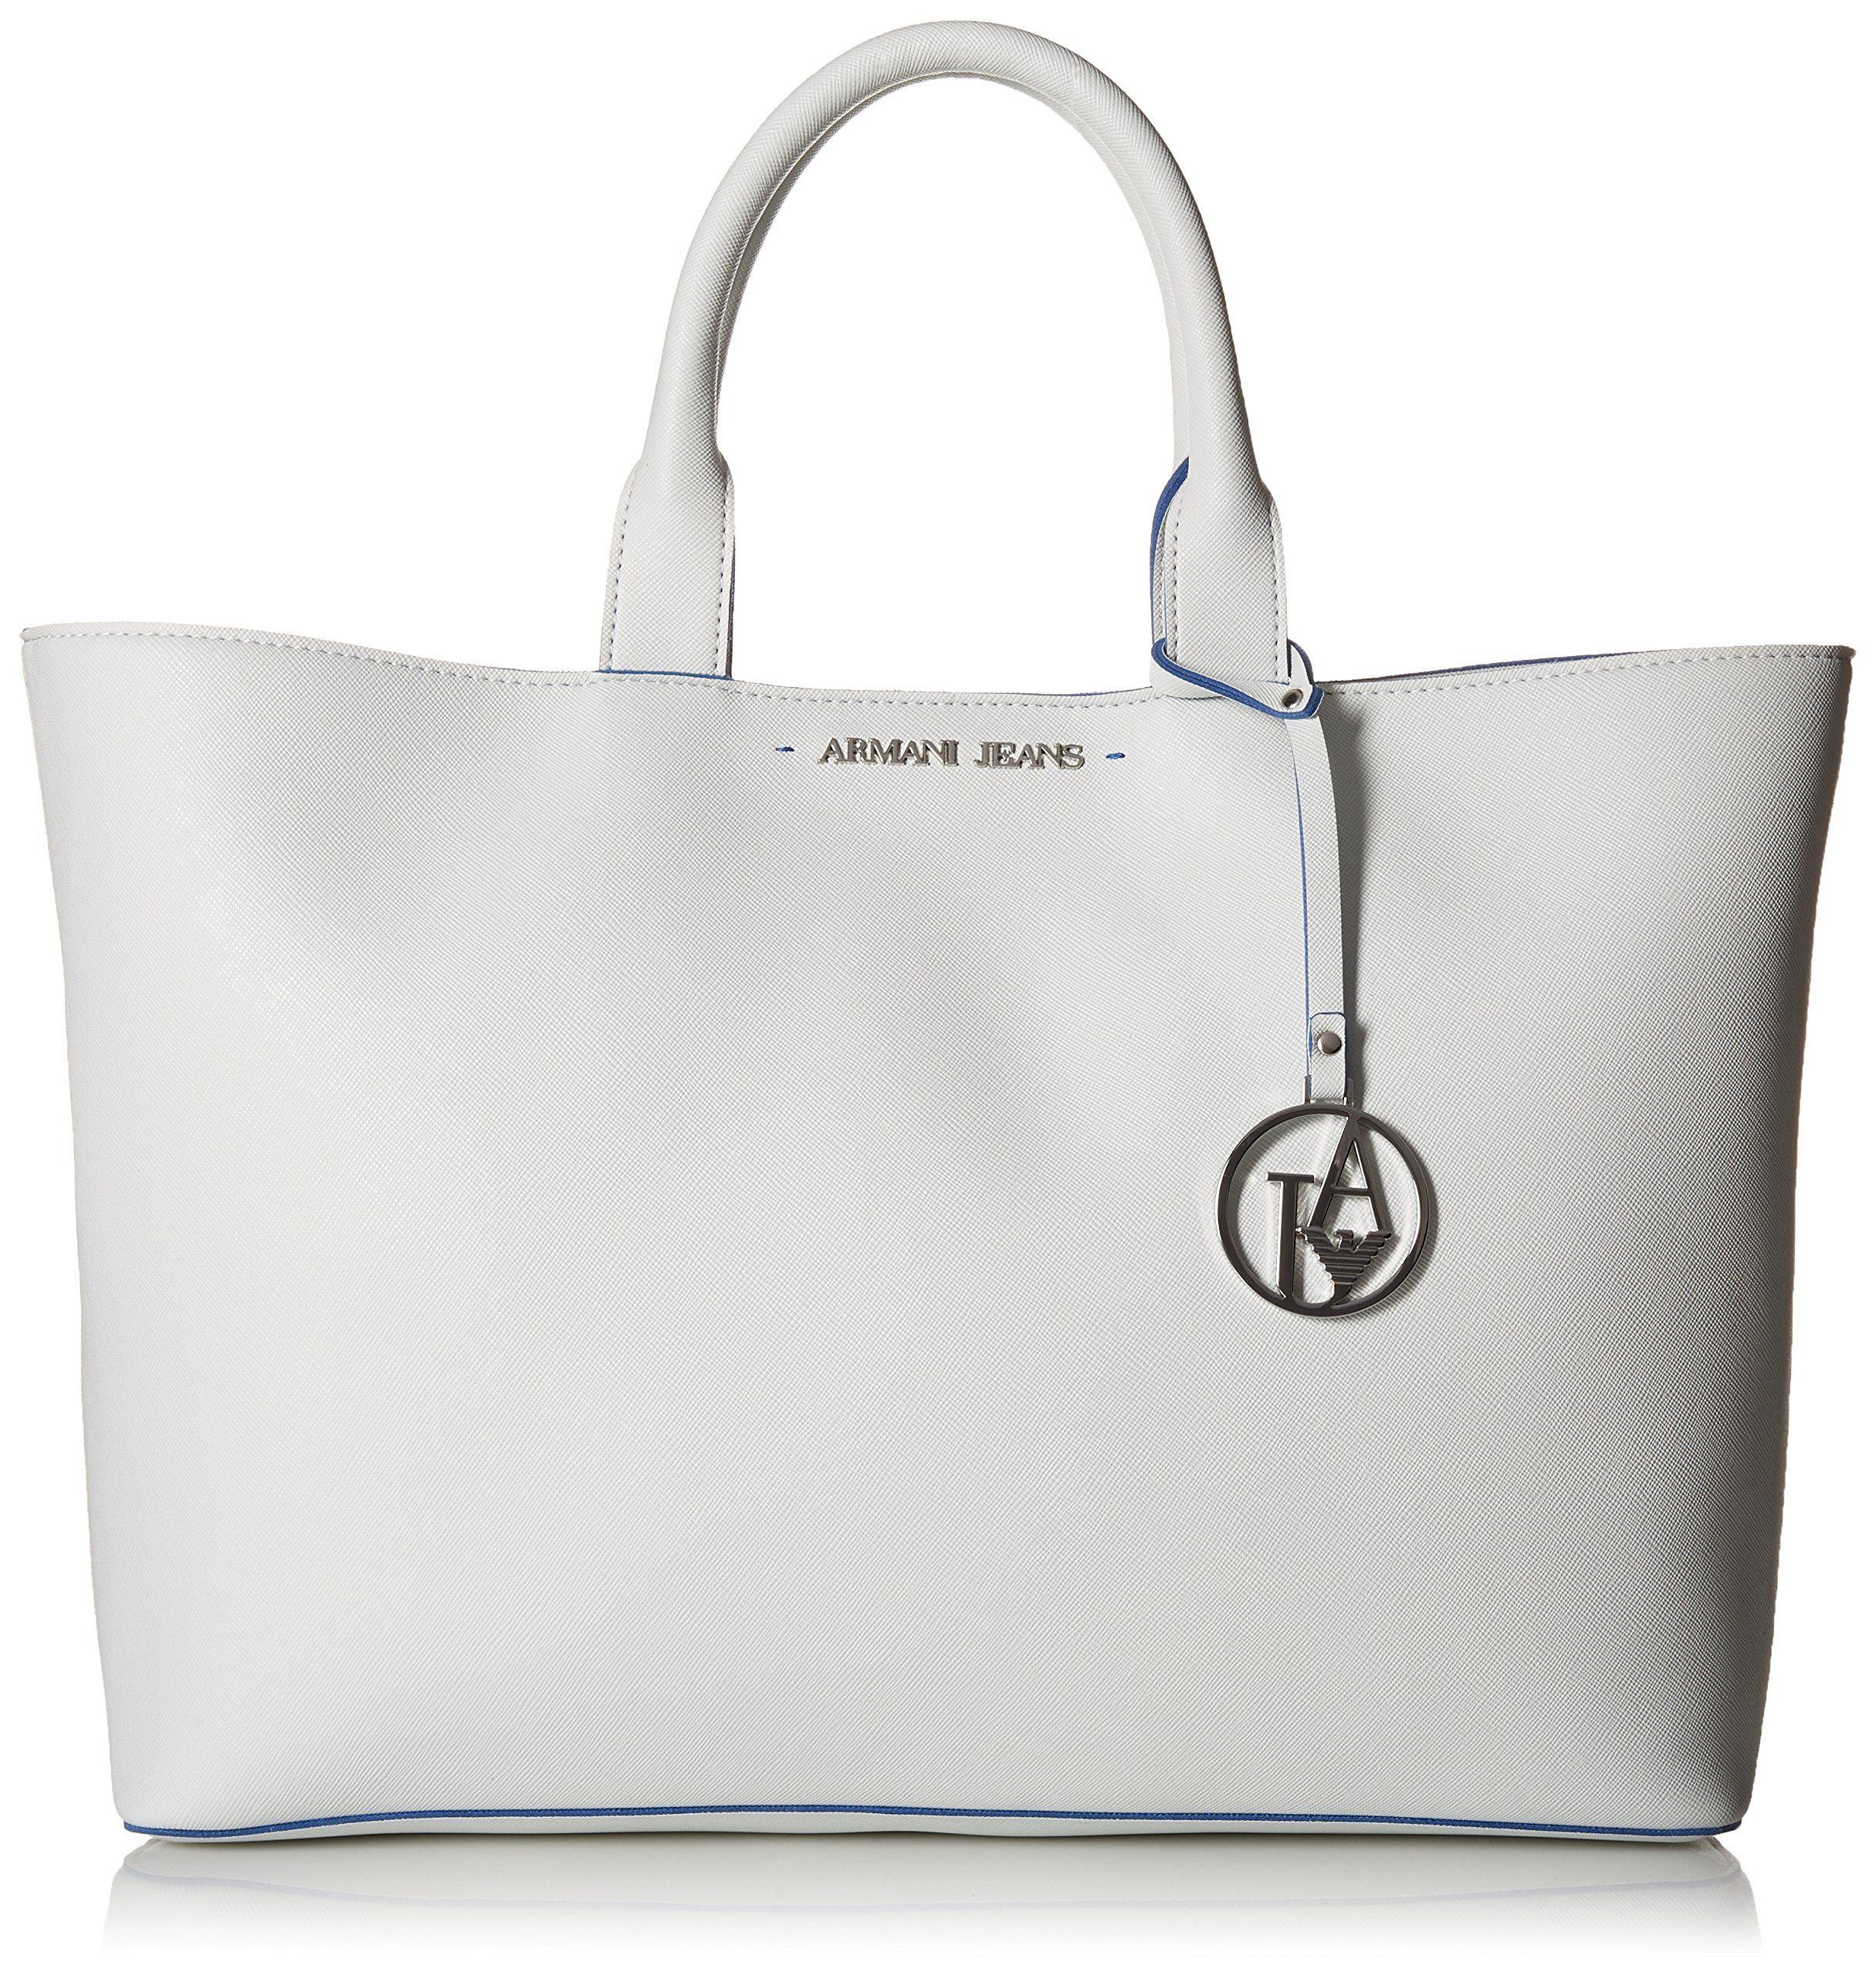 6e57dfc28797 Armani Jeans Large Eco Saffiano Tote Shoulder Bag